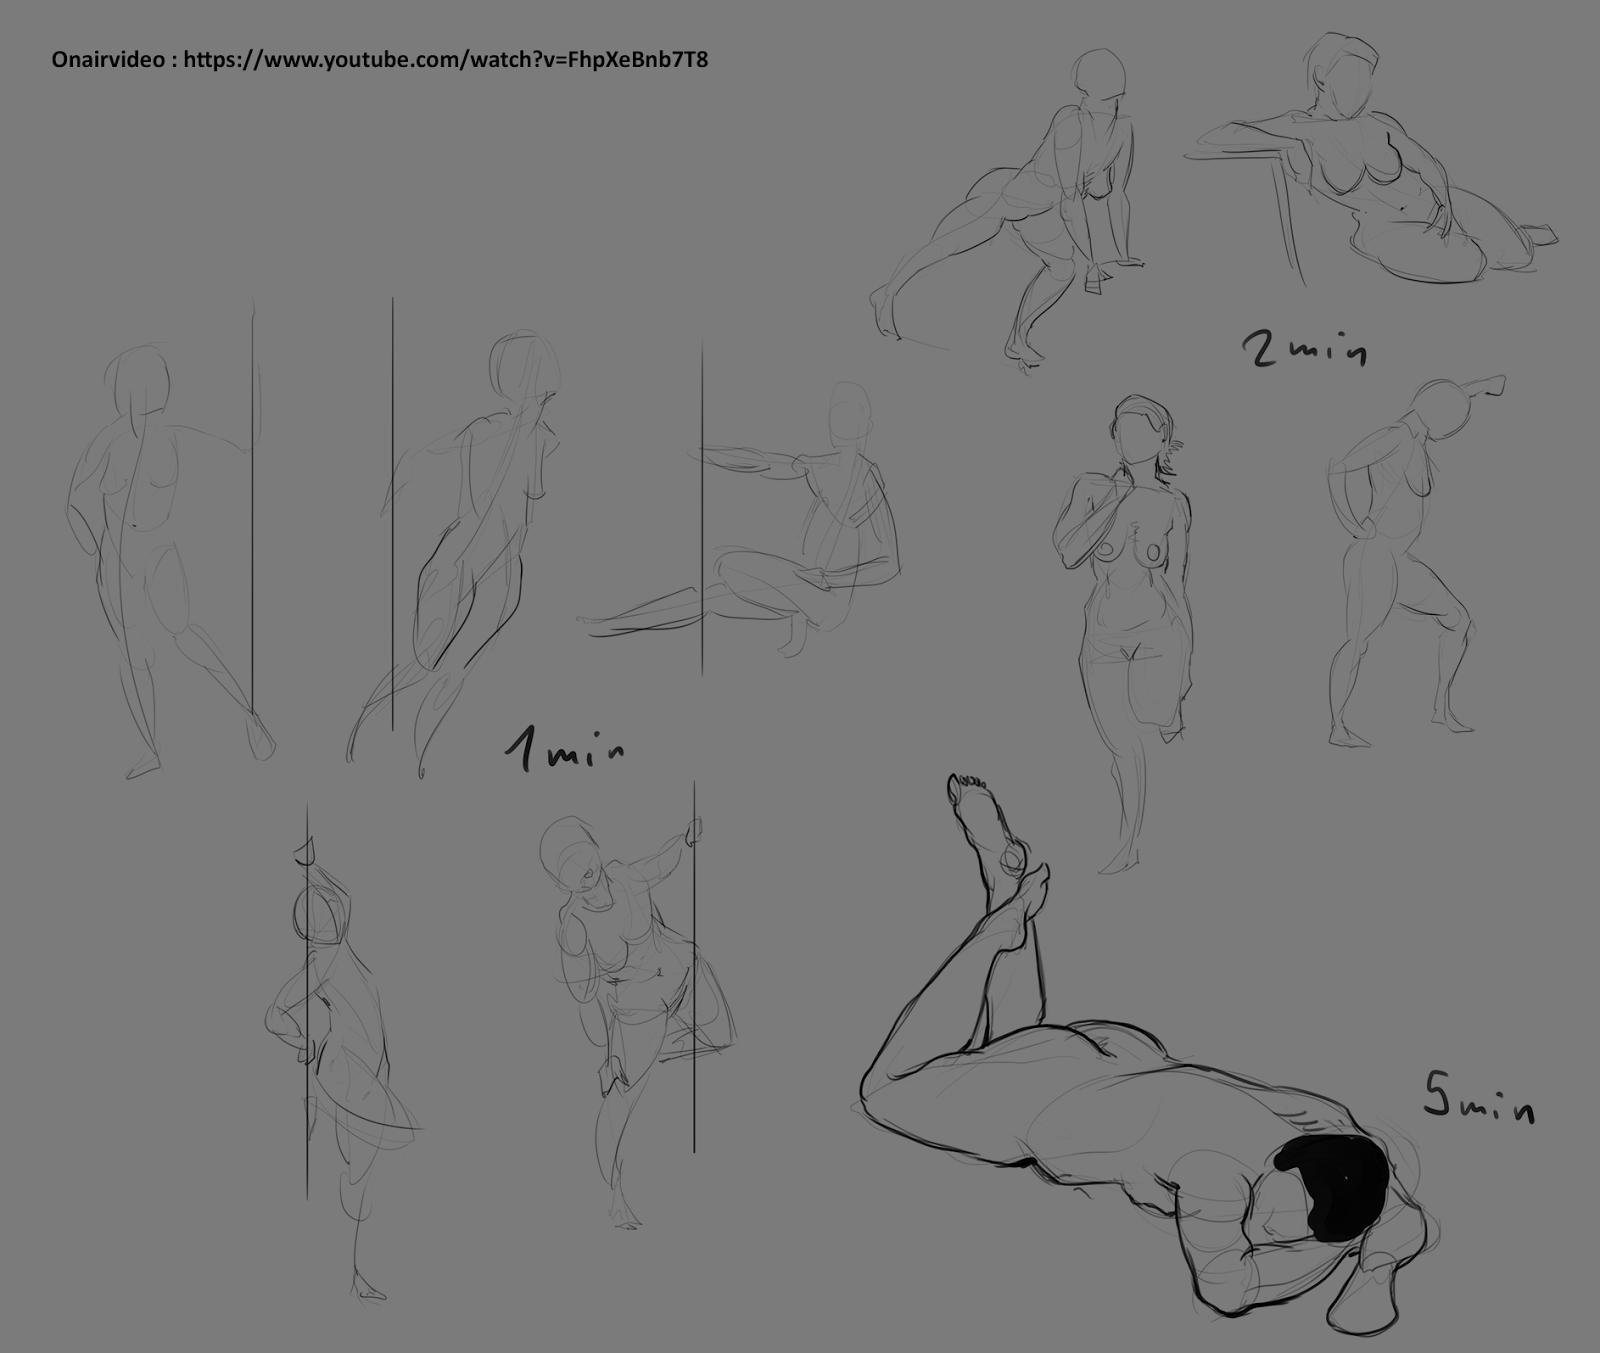 XaB au travail ! [nudity inside] - Page 12 SpeedStudies_2016-10-04-onairvideo